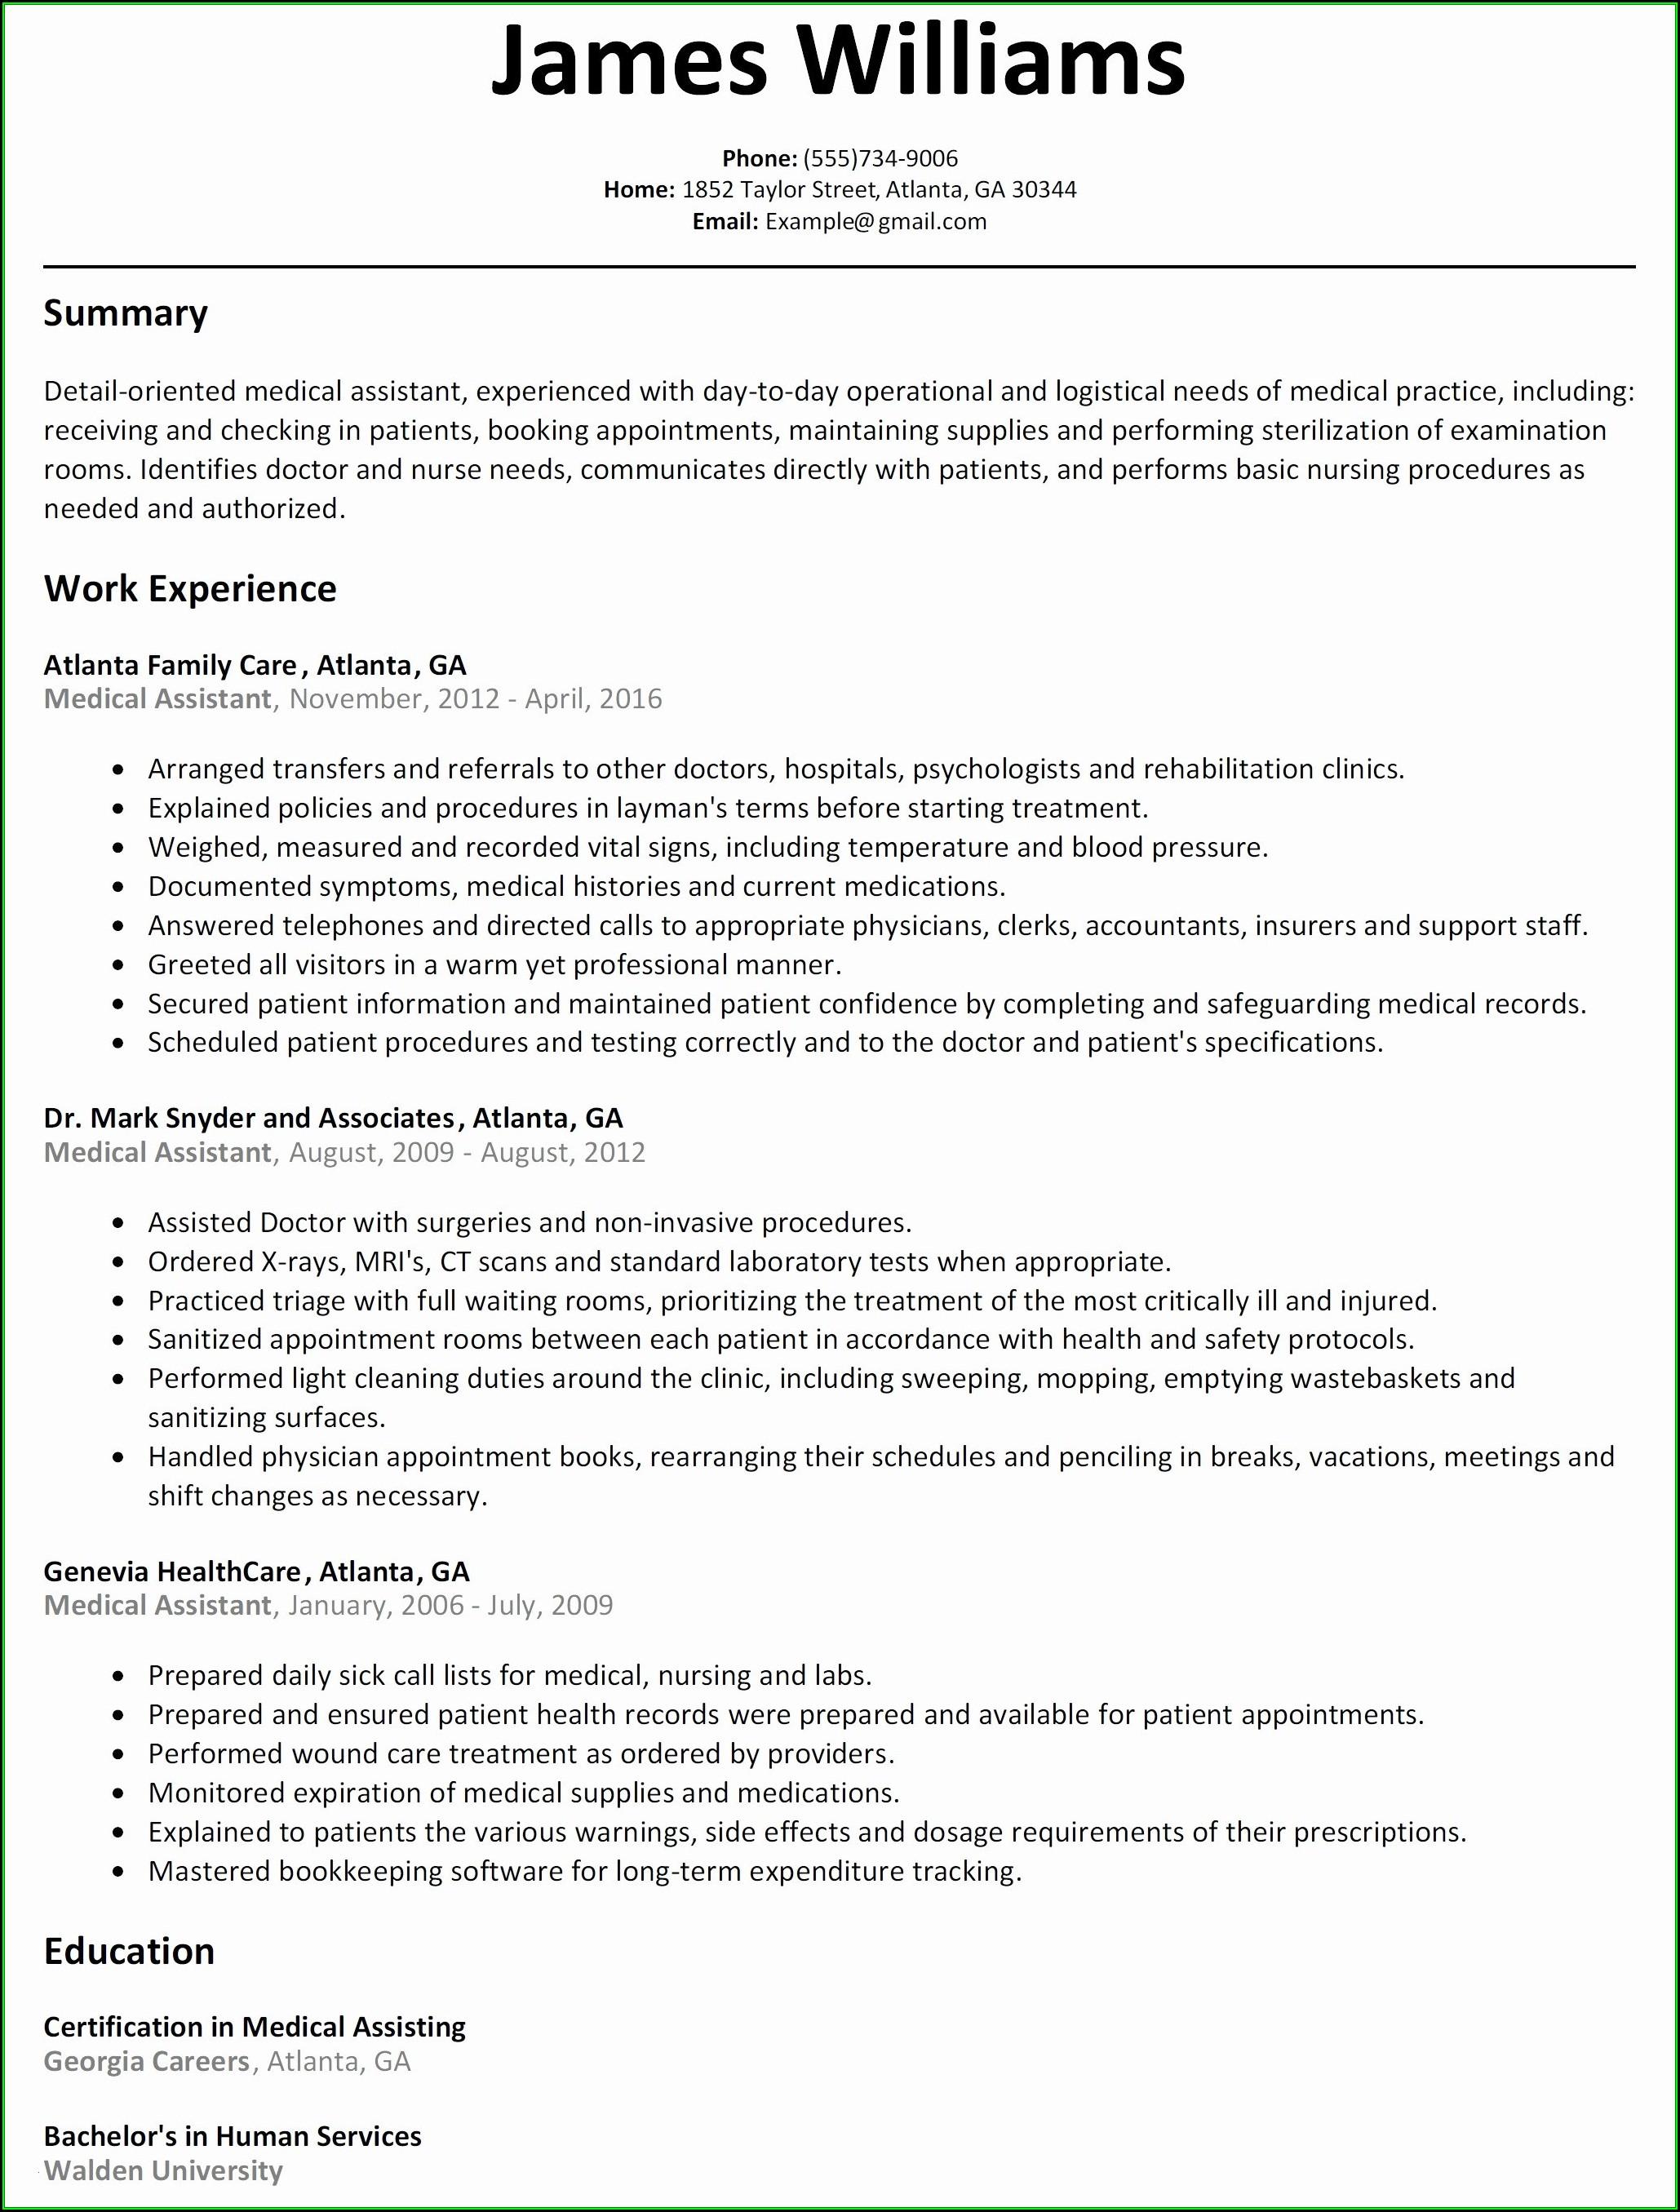 Professional Resume Writers For Nurses